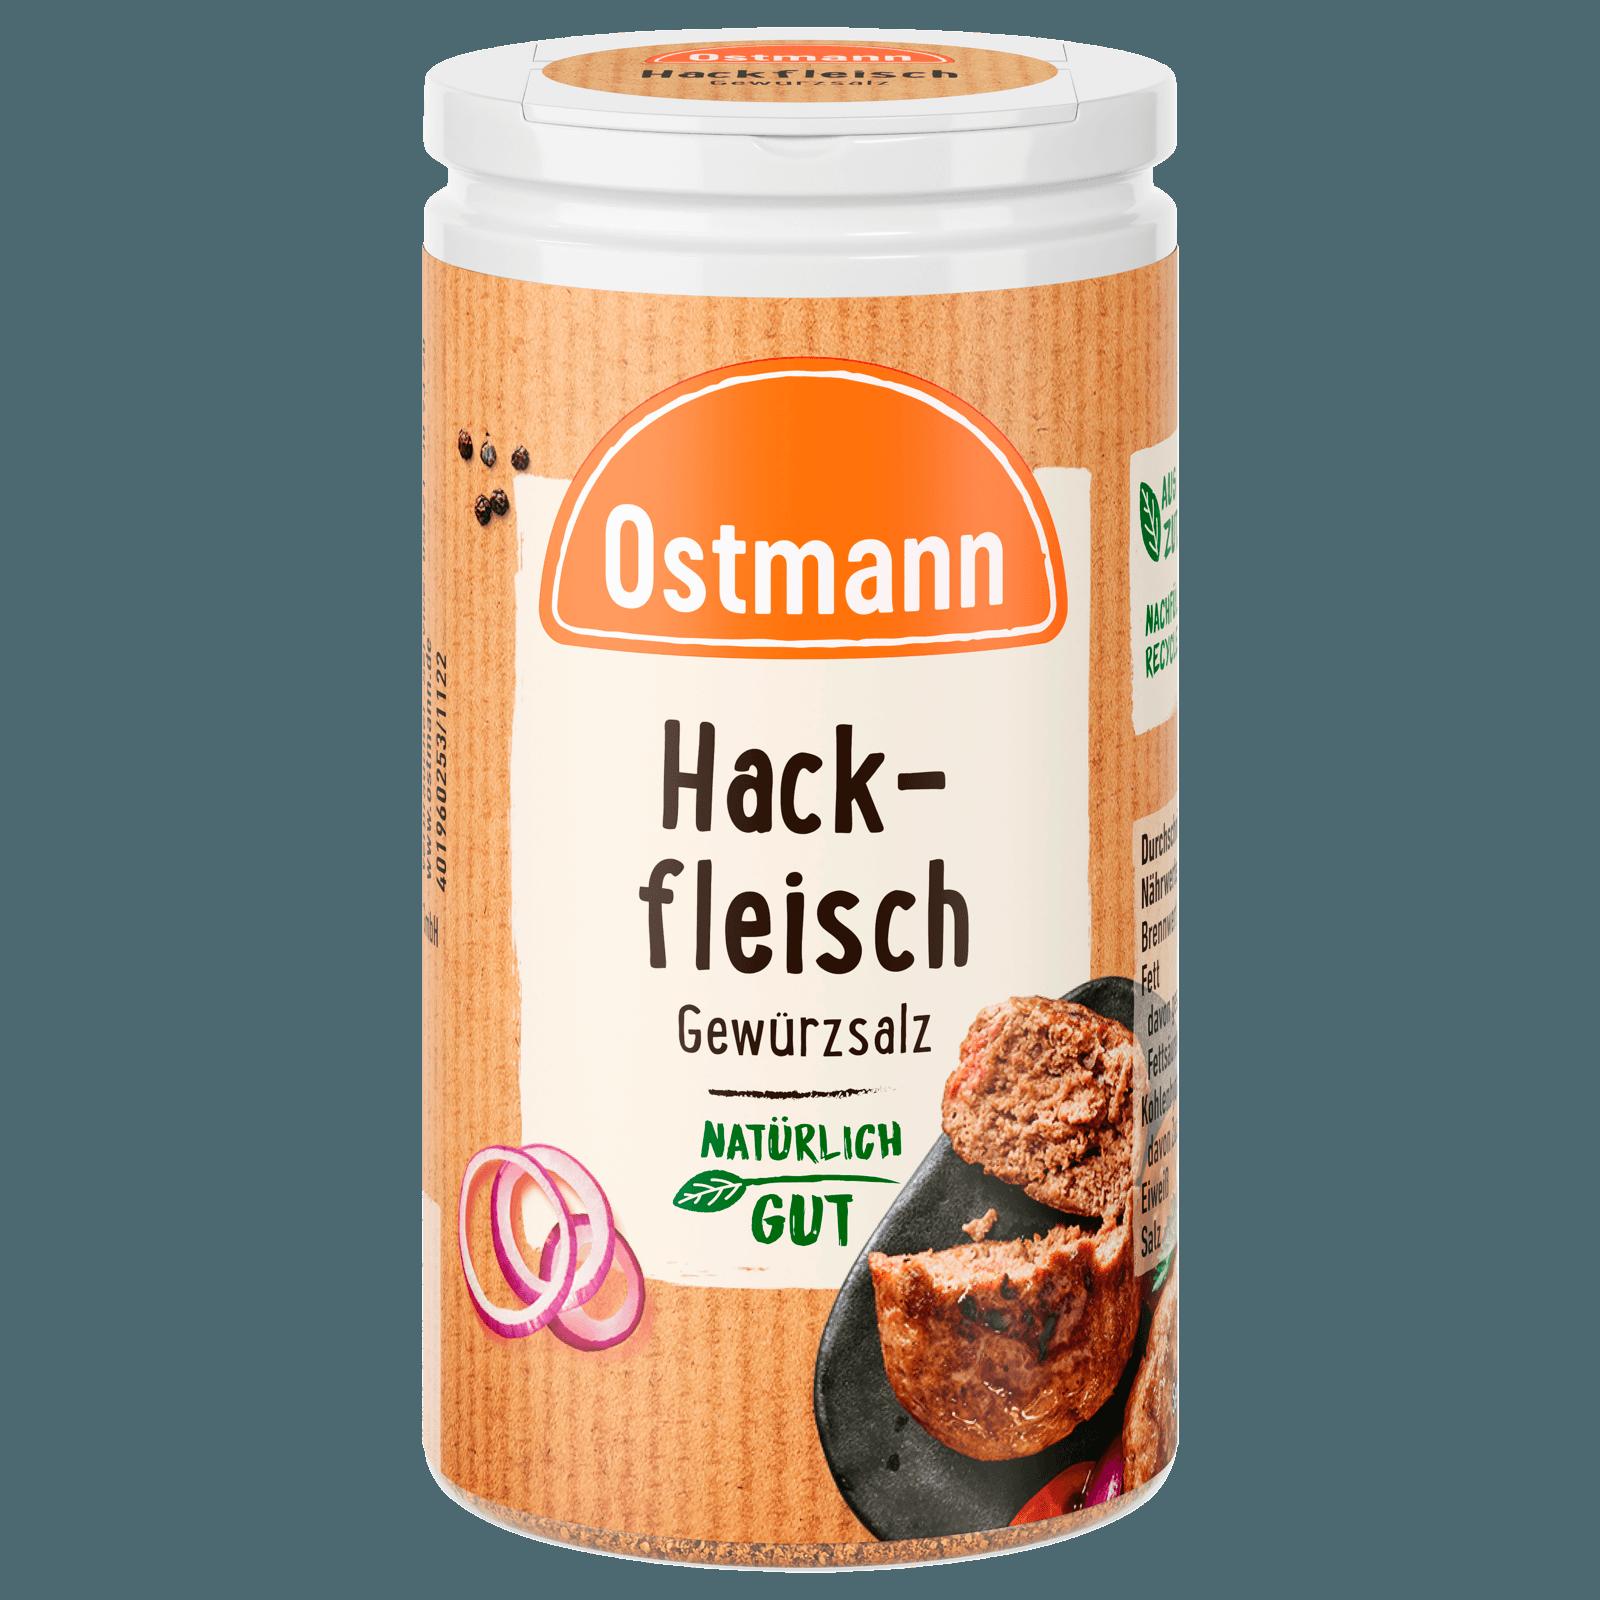 Ostmann Hackfleisch-Würzer 60g